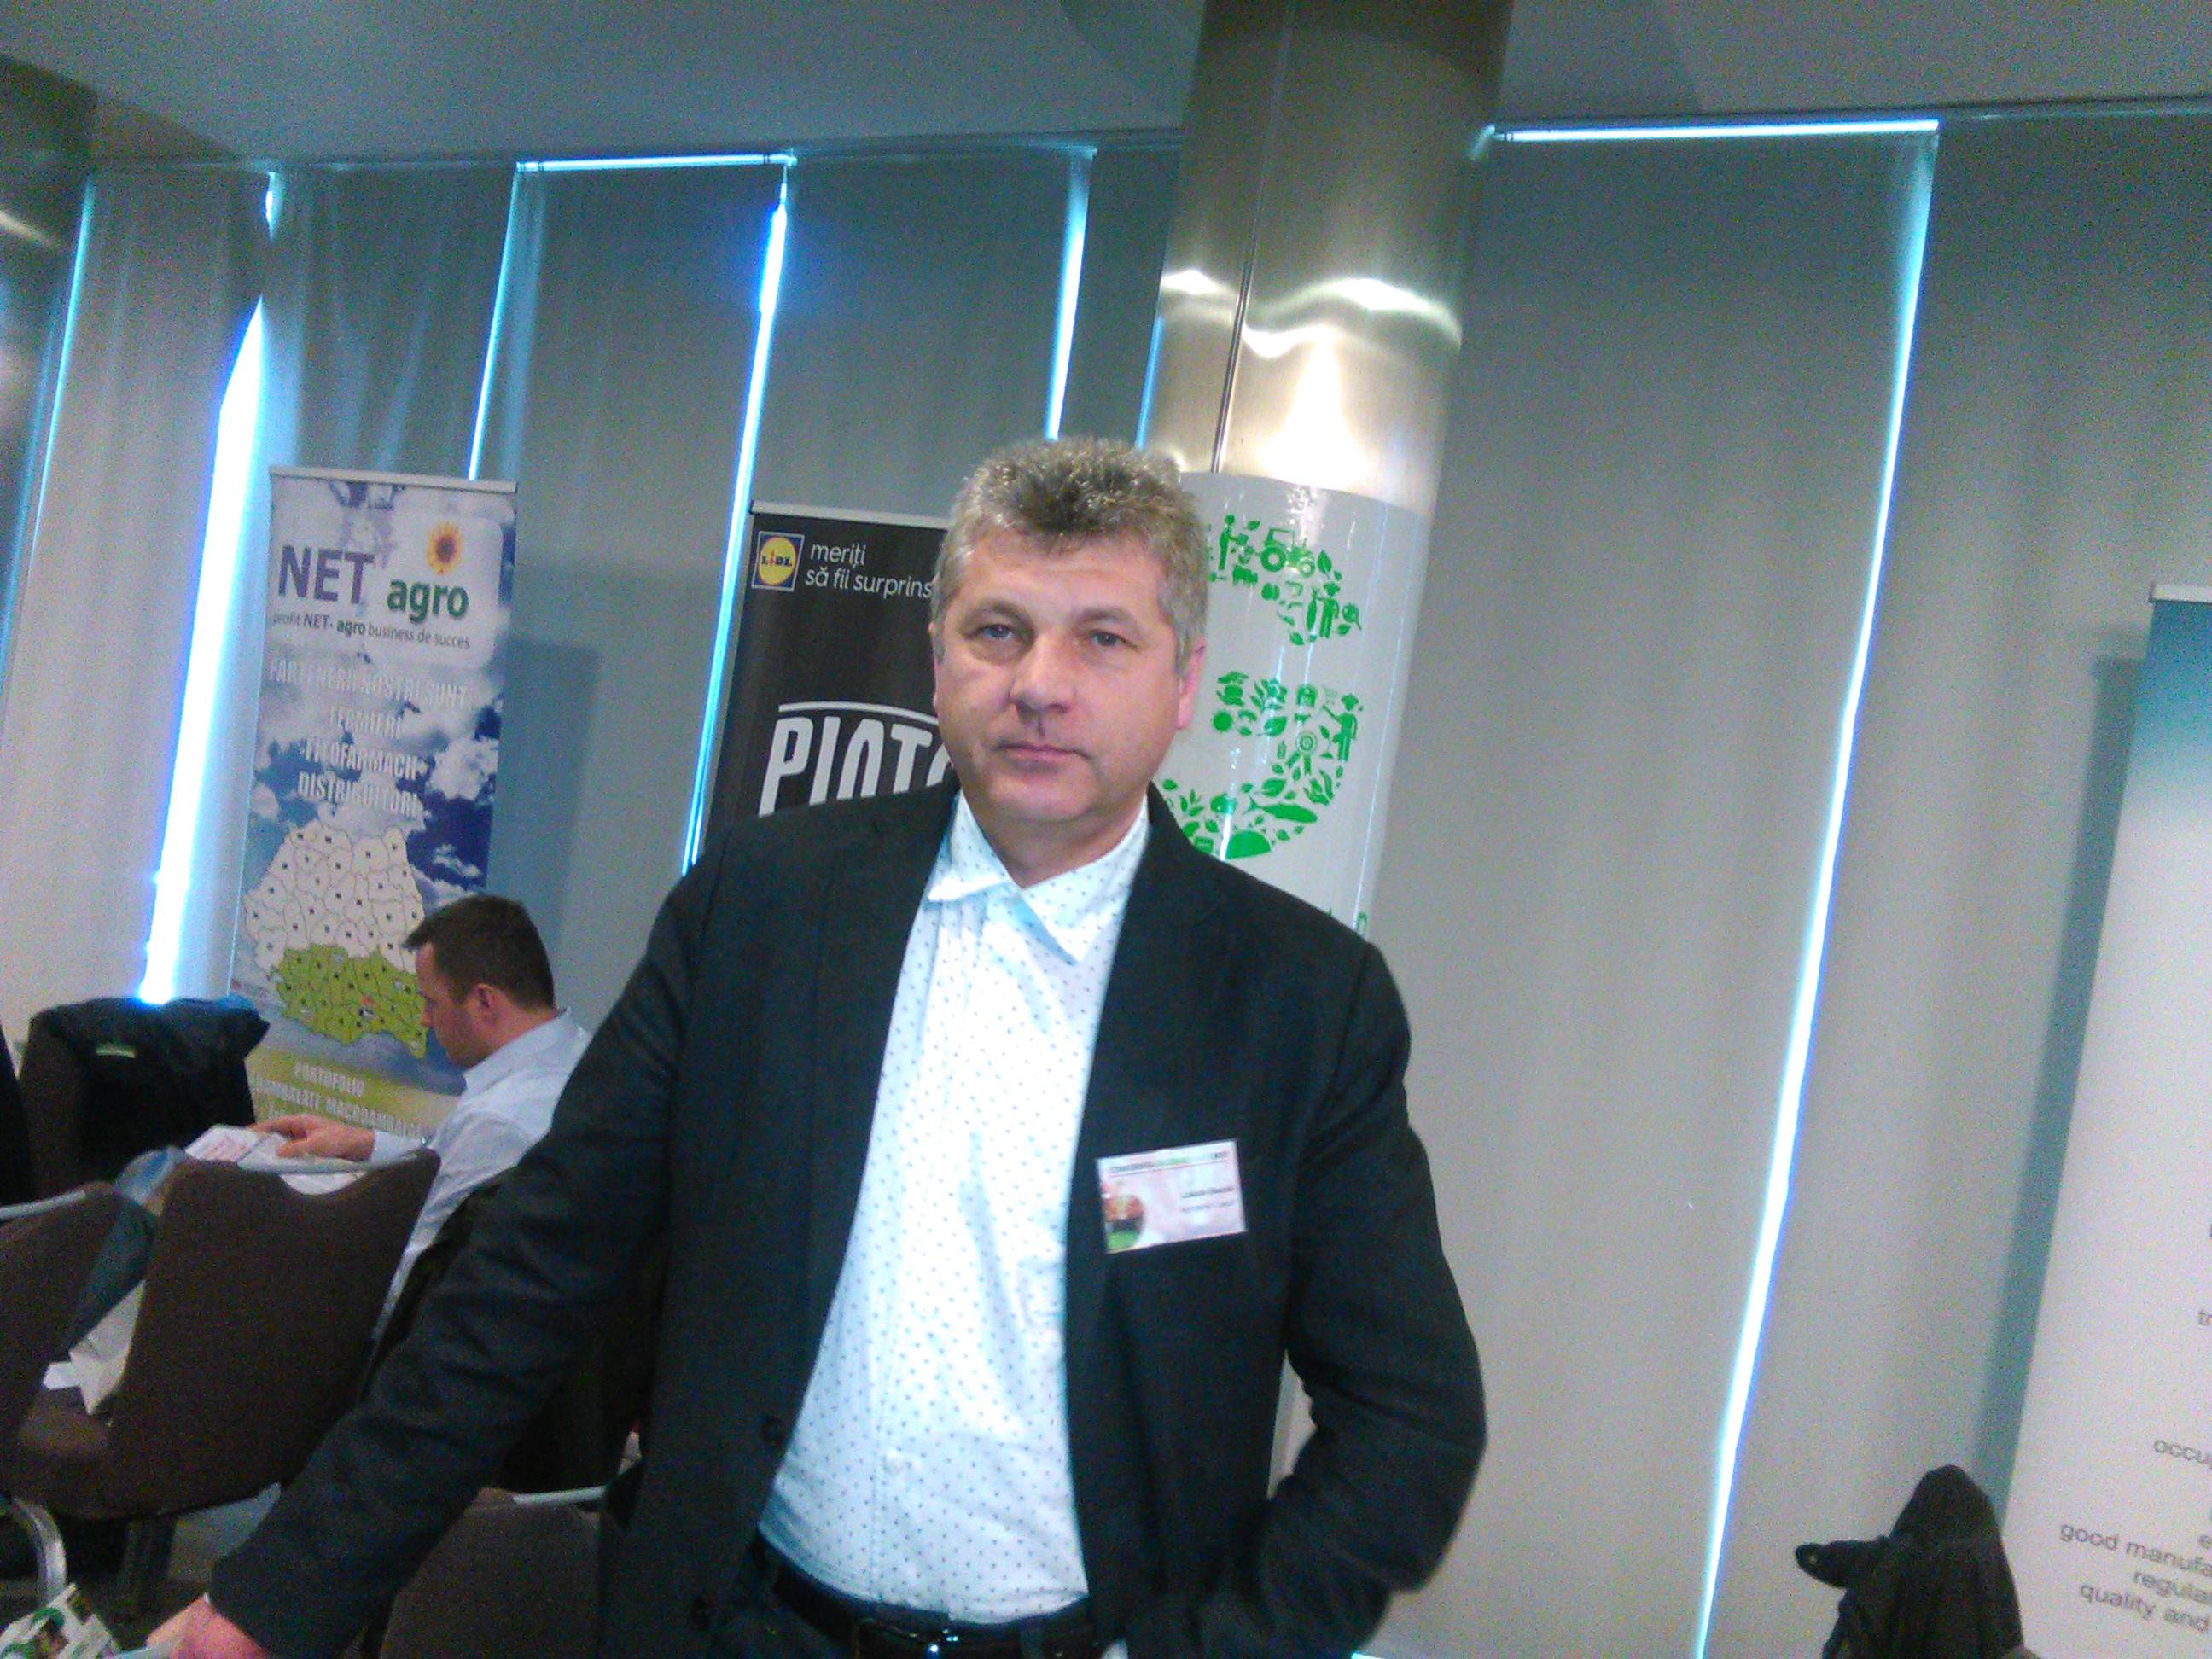 Laszlo Becsek, Agroprod: Cartofii din import intra cu 50-60 bani/kg. Noua ne trebuie minimum 70 bani/kg ca sa acoperim costurile